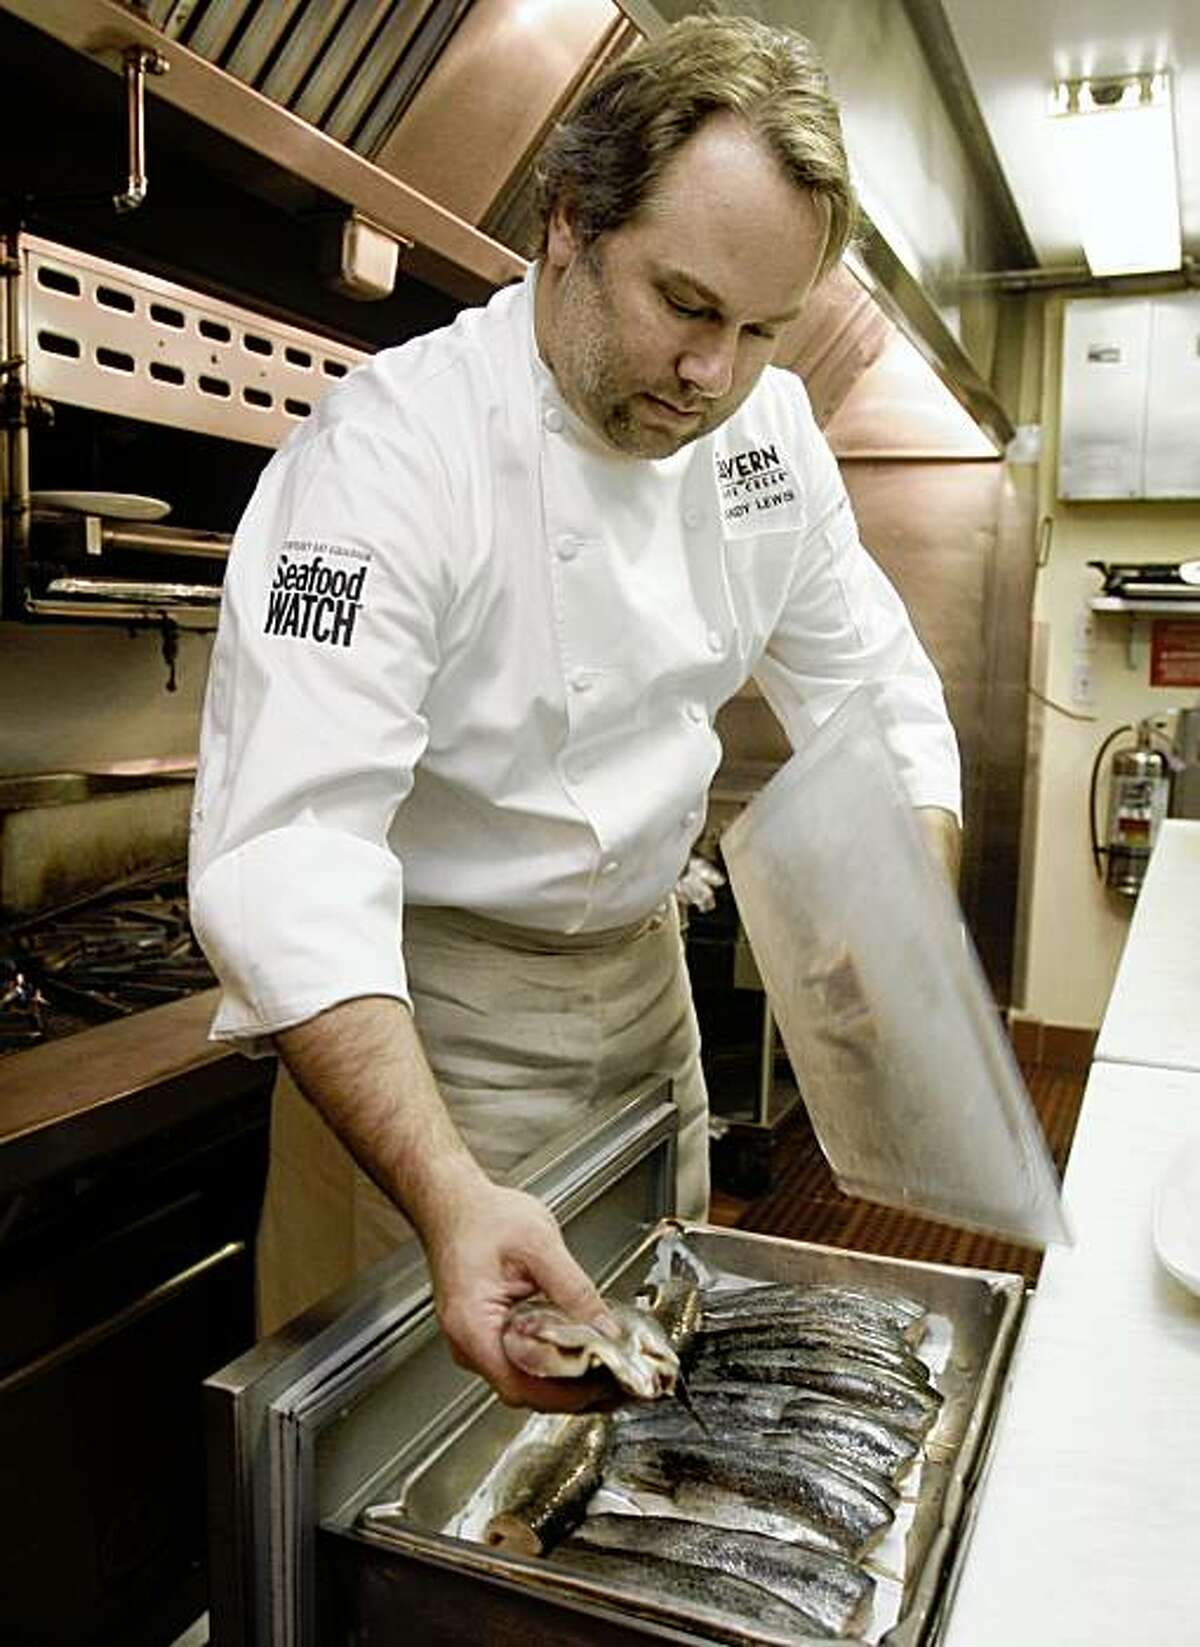 Chef Randy Lewis preparing trout at Tavern at Lark Creek in Larkspur, Calif., on Monday, October 19, 2009.